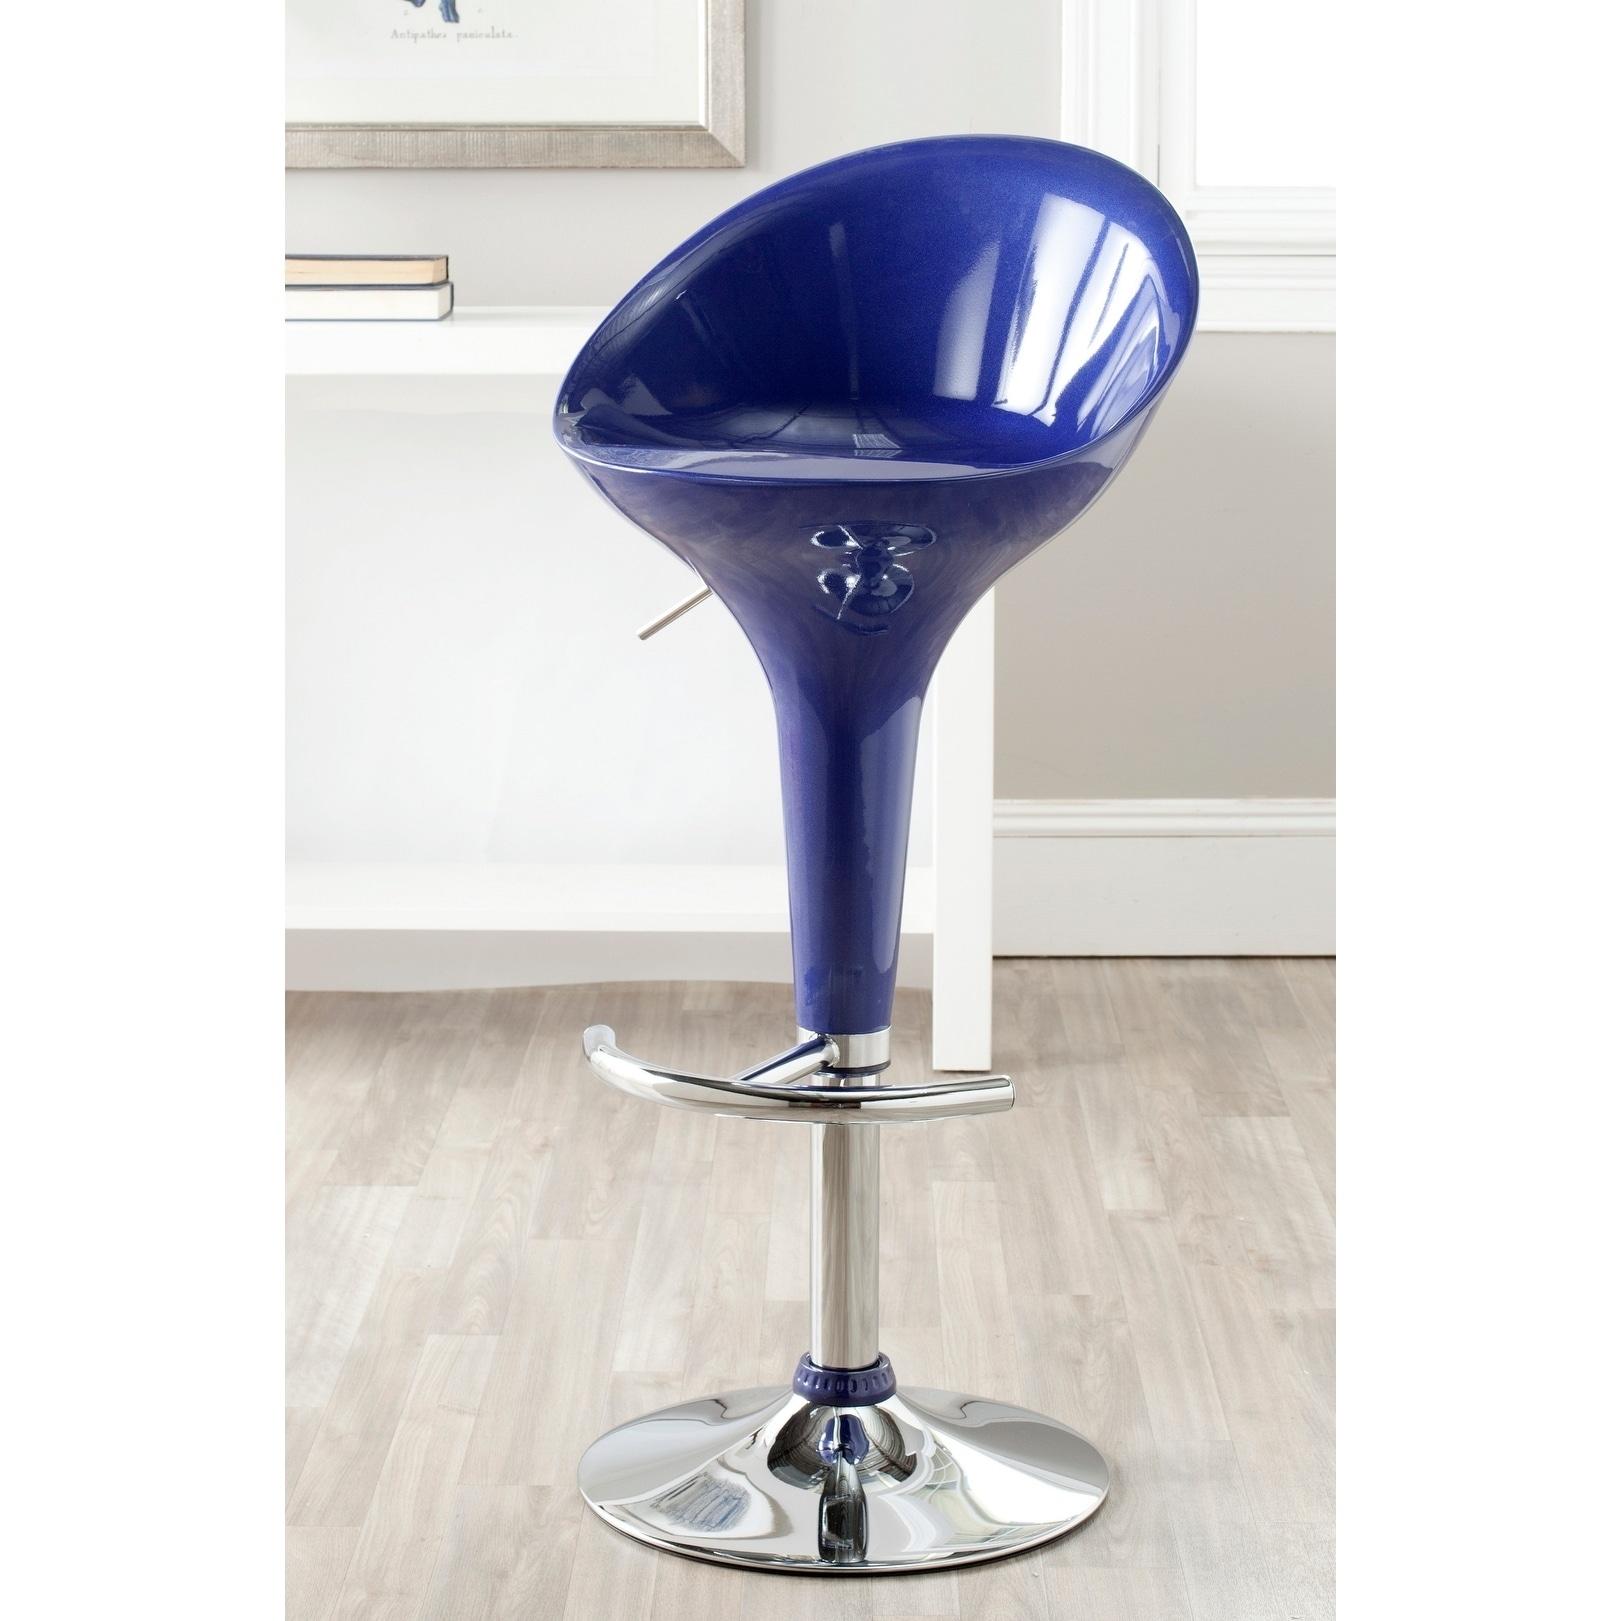 Safavieh Zorab Royal Adjustable 24-32-inch Bar Stool (FOX...